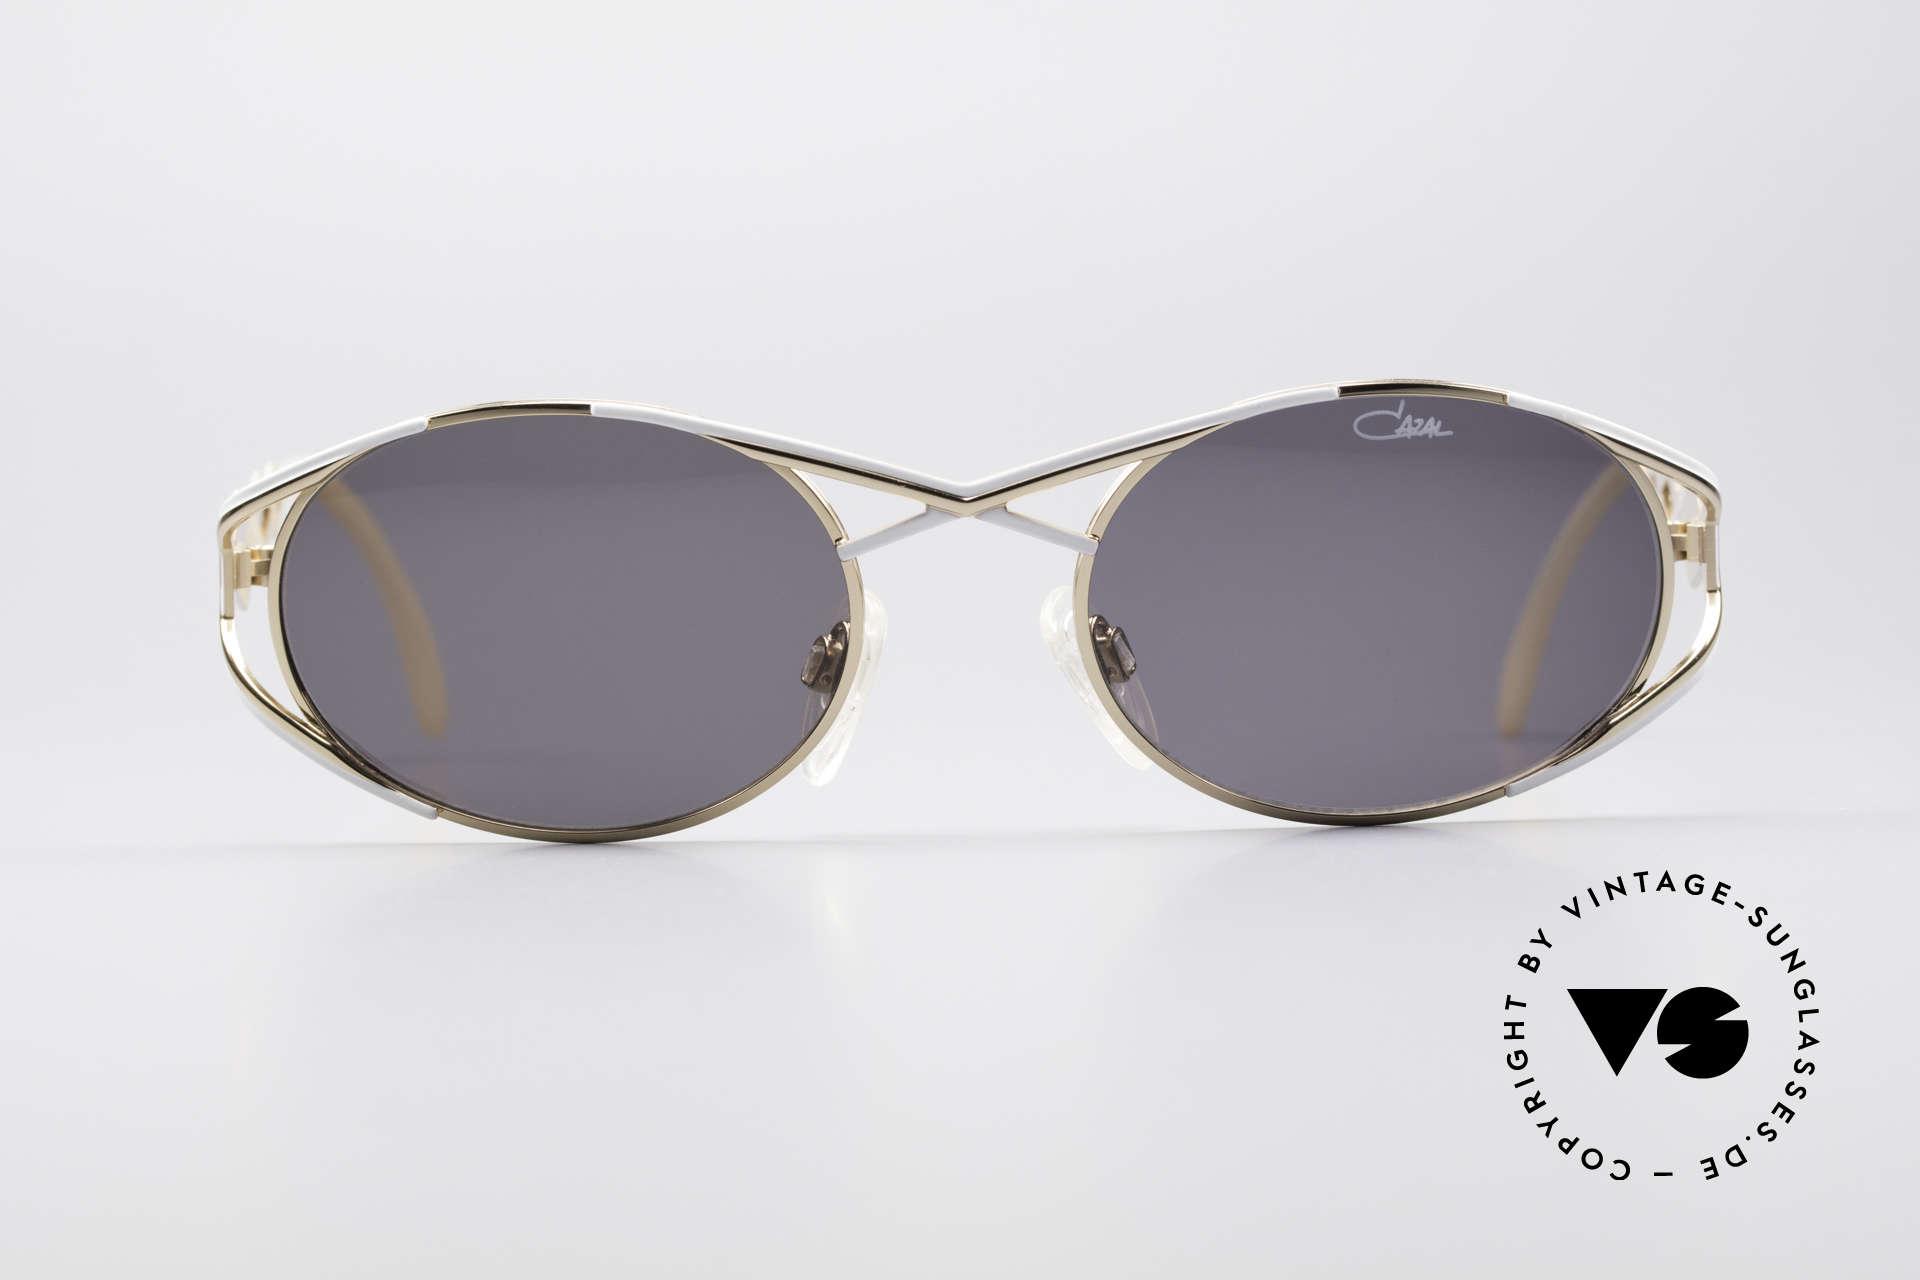 2e14cf1236 Sunglasses Cazal 977 90 s Designer Shades Women